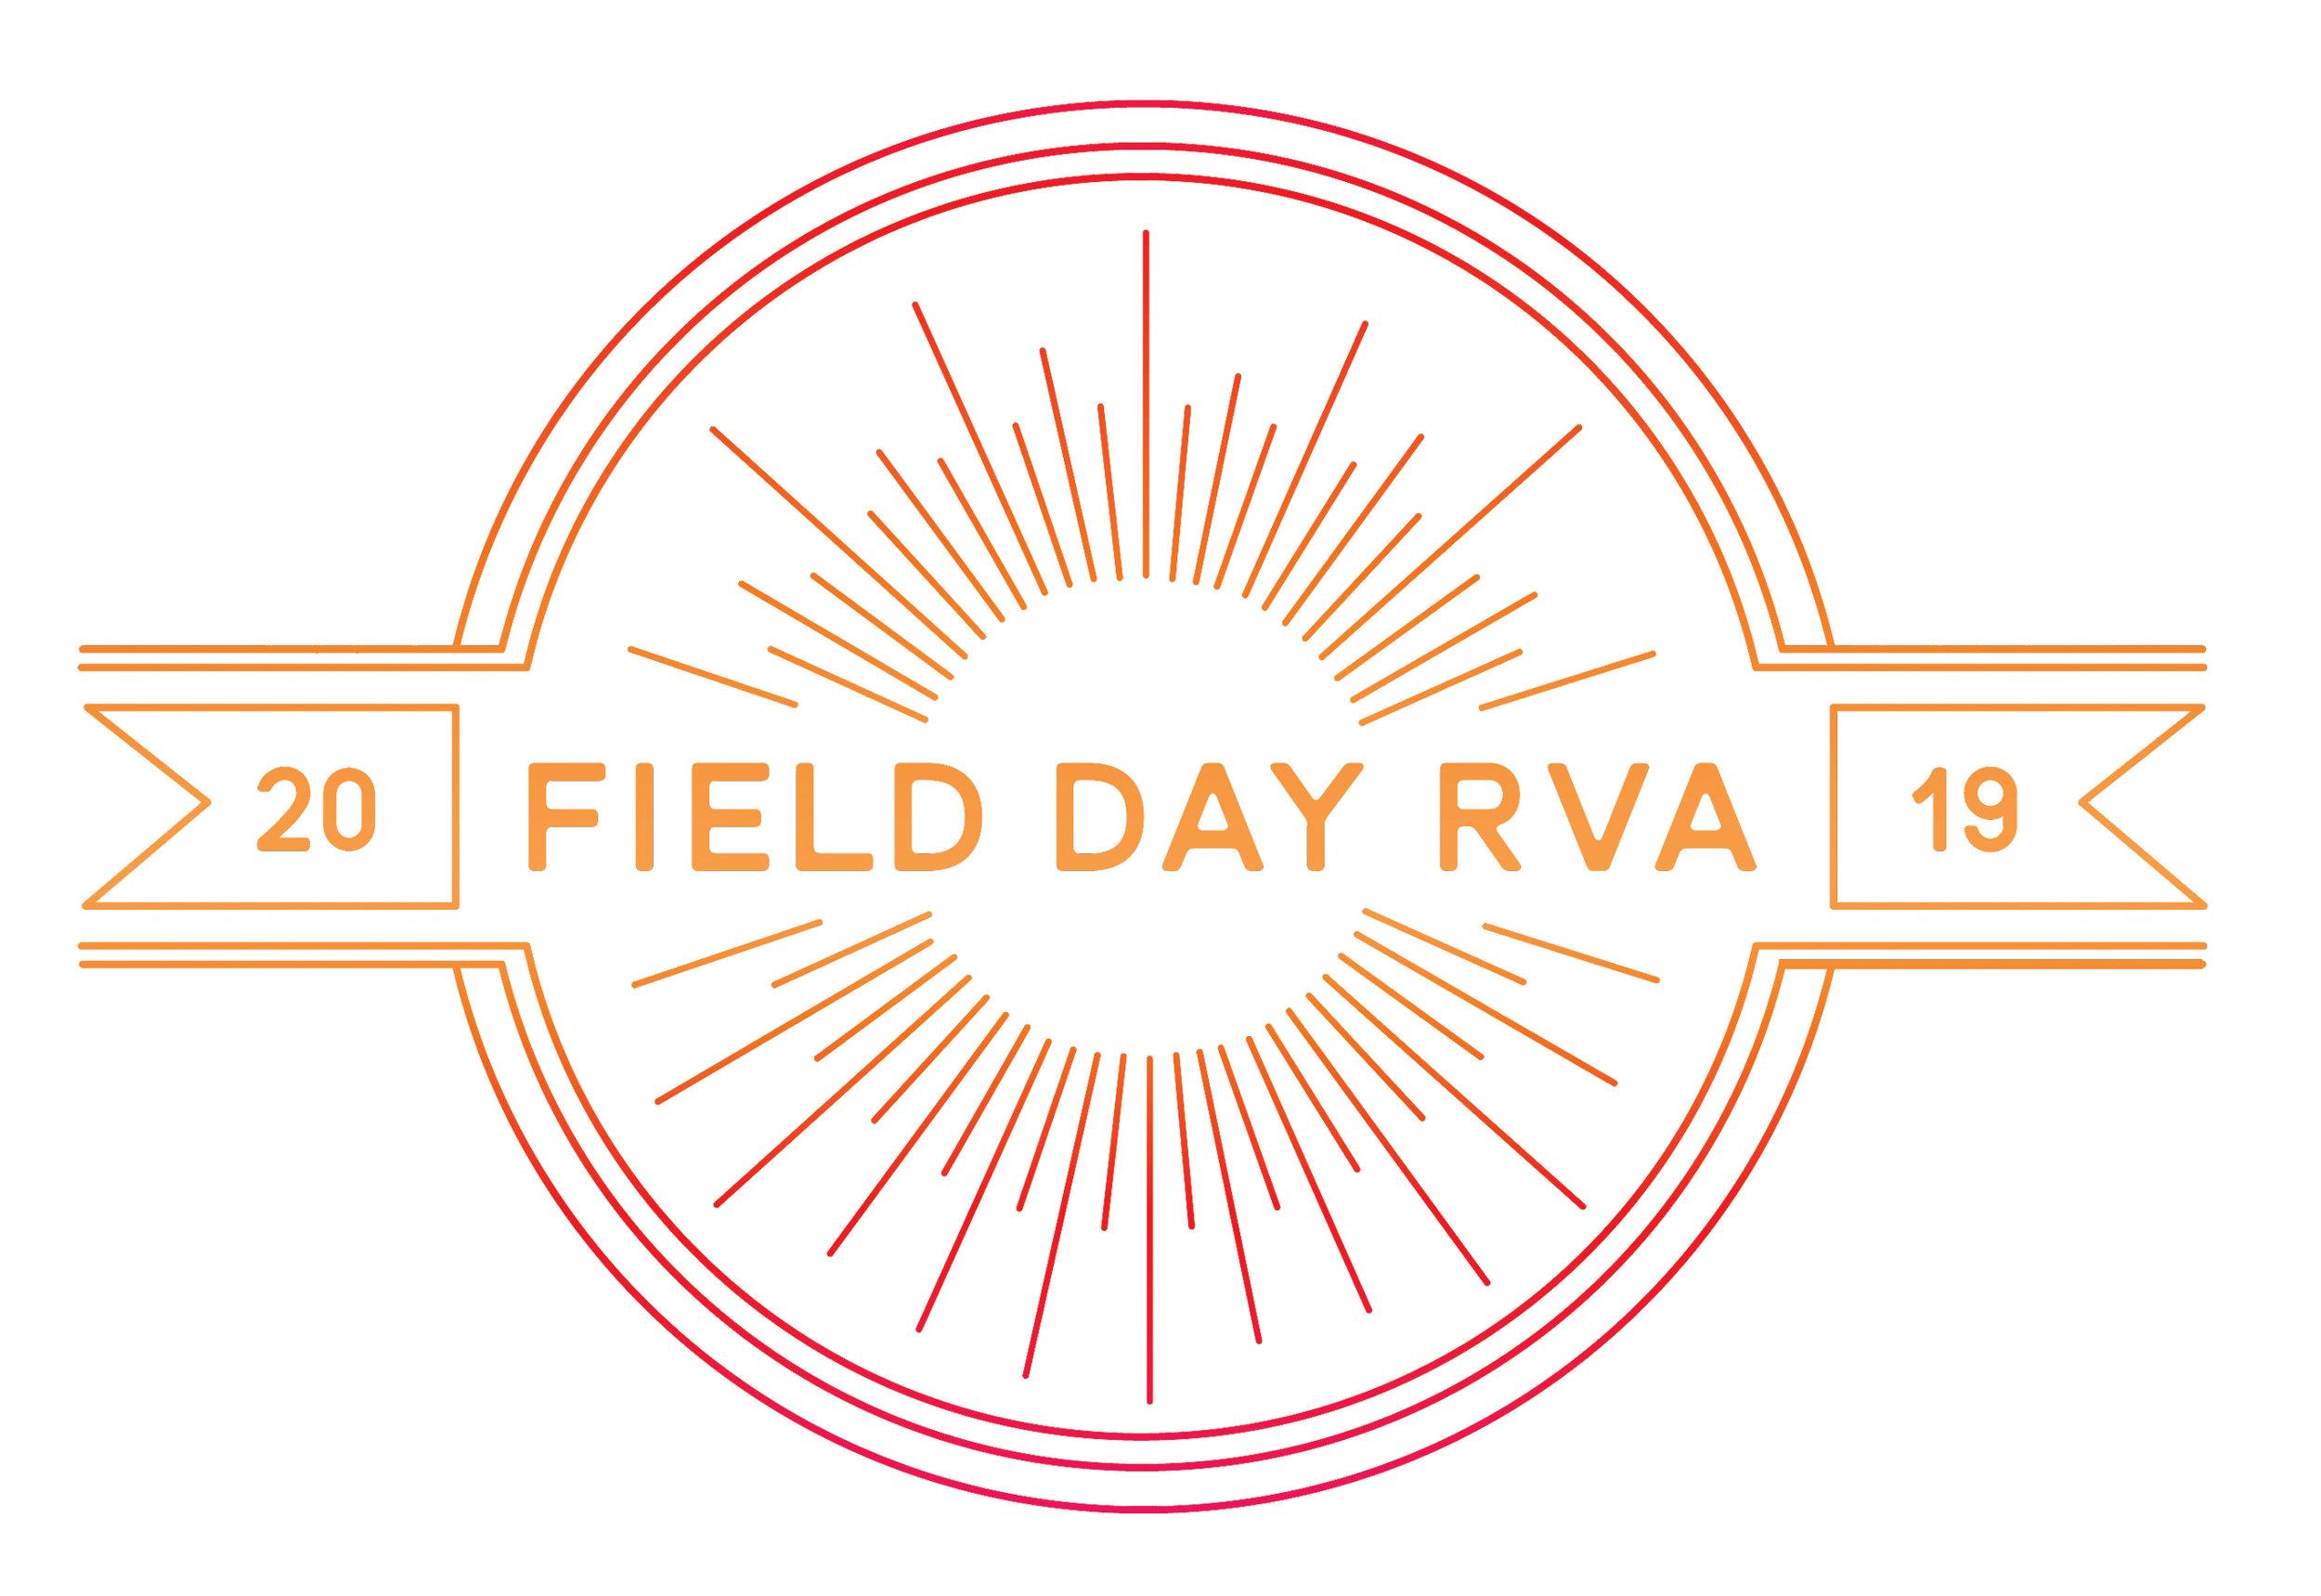 Field Day RVA_Tshirt Design.jpg